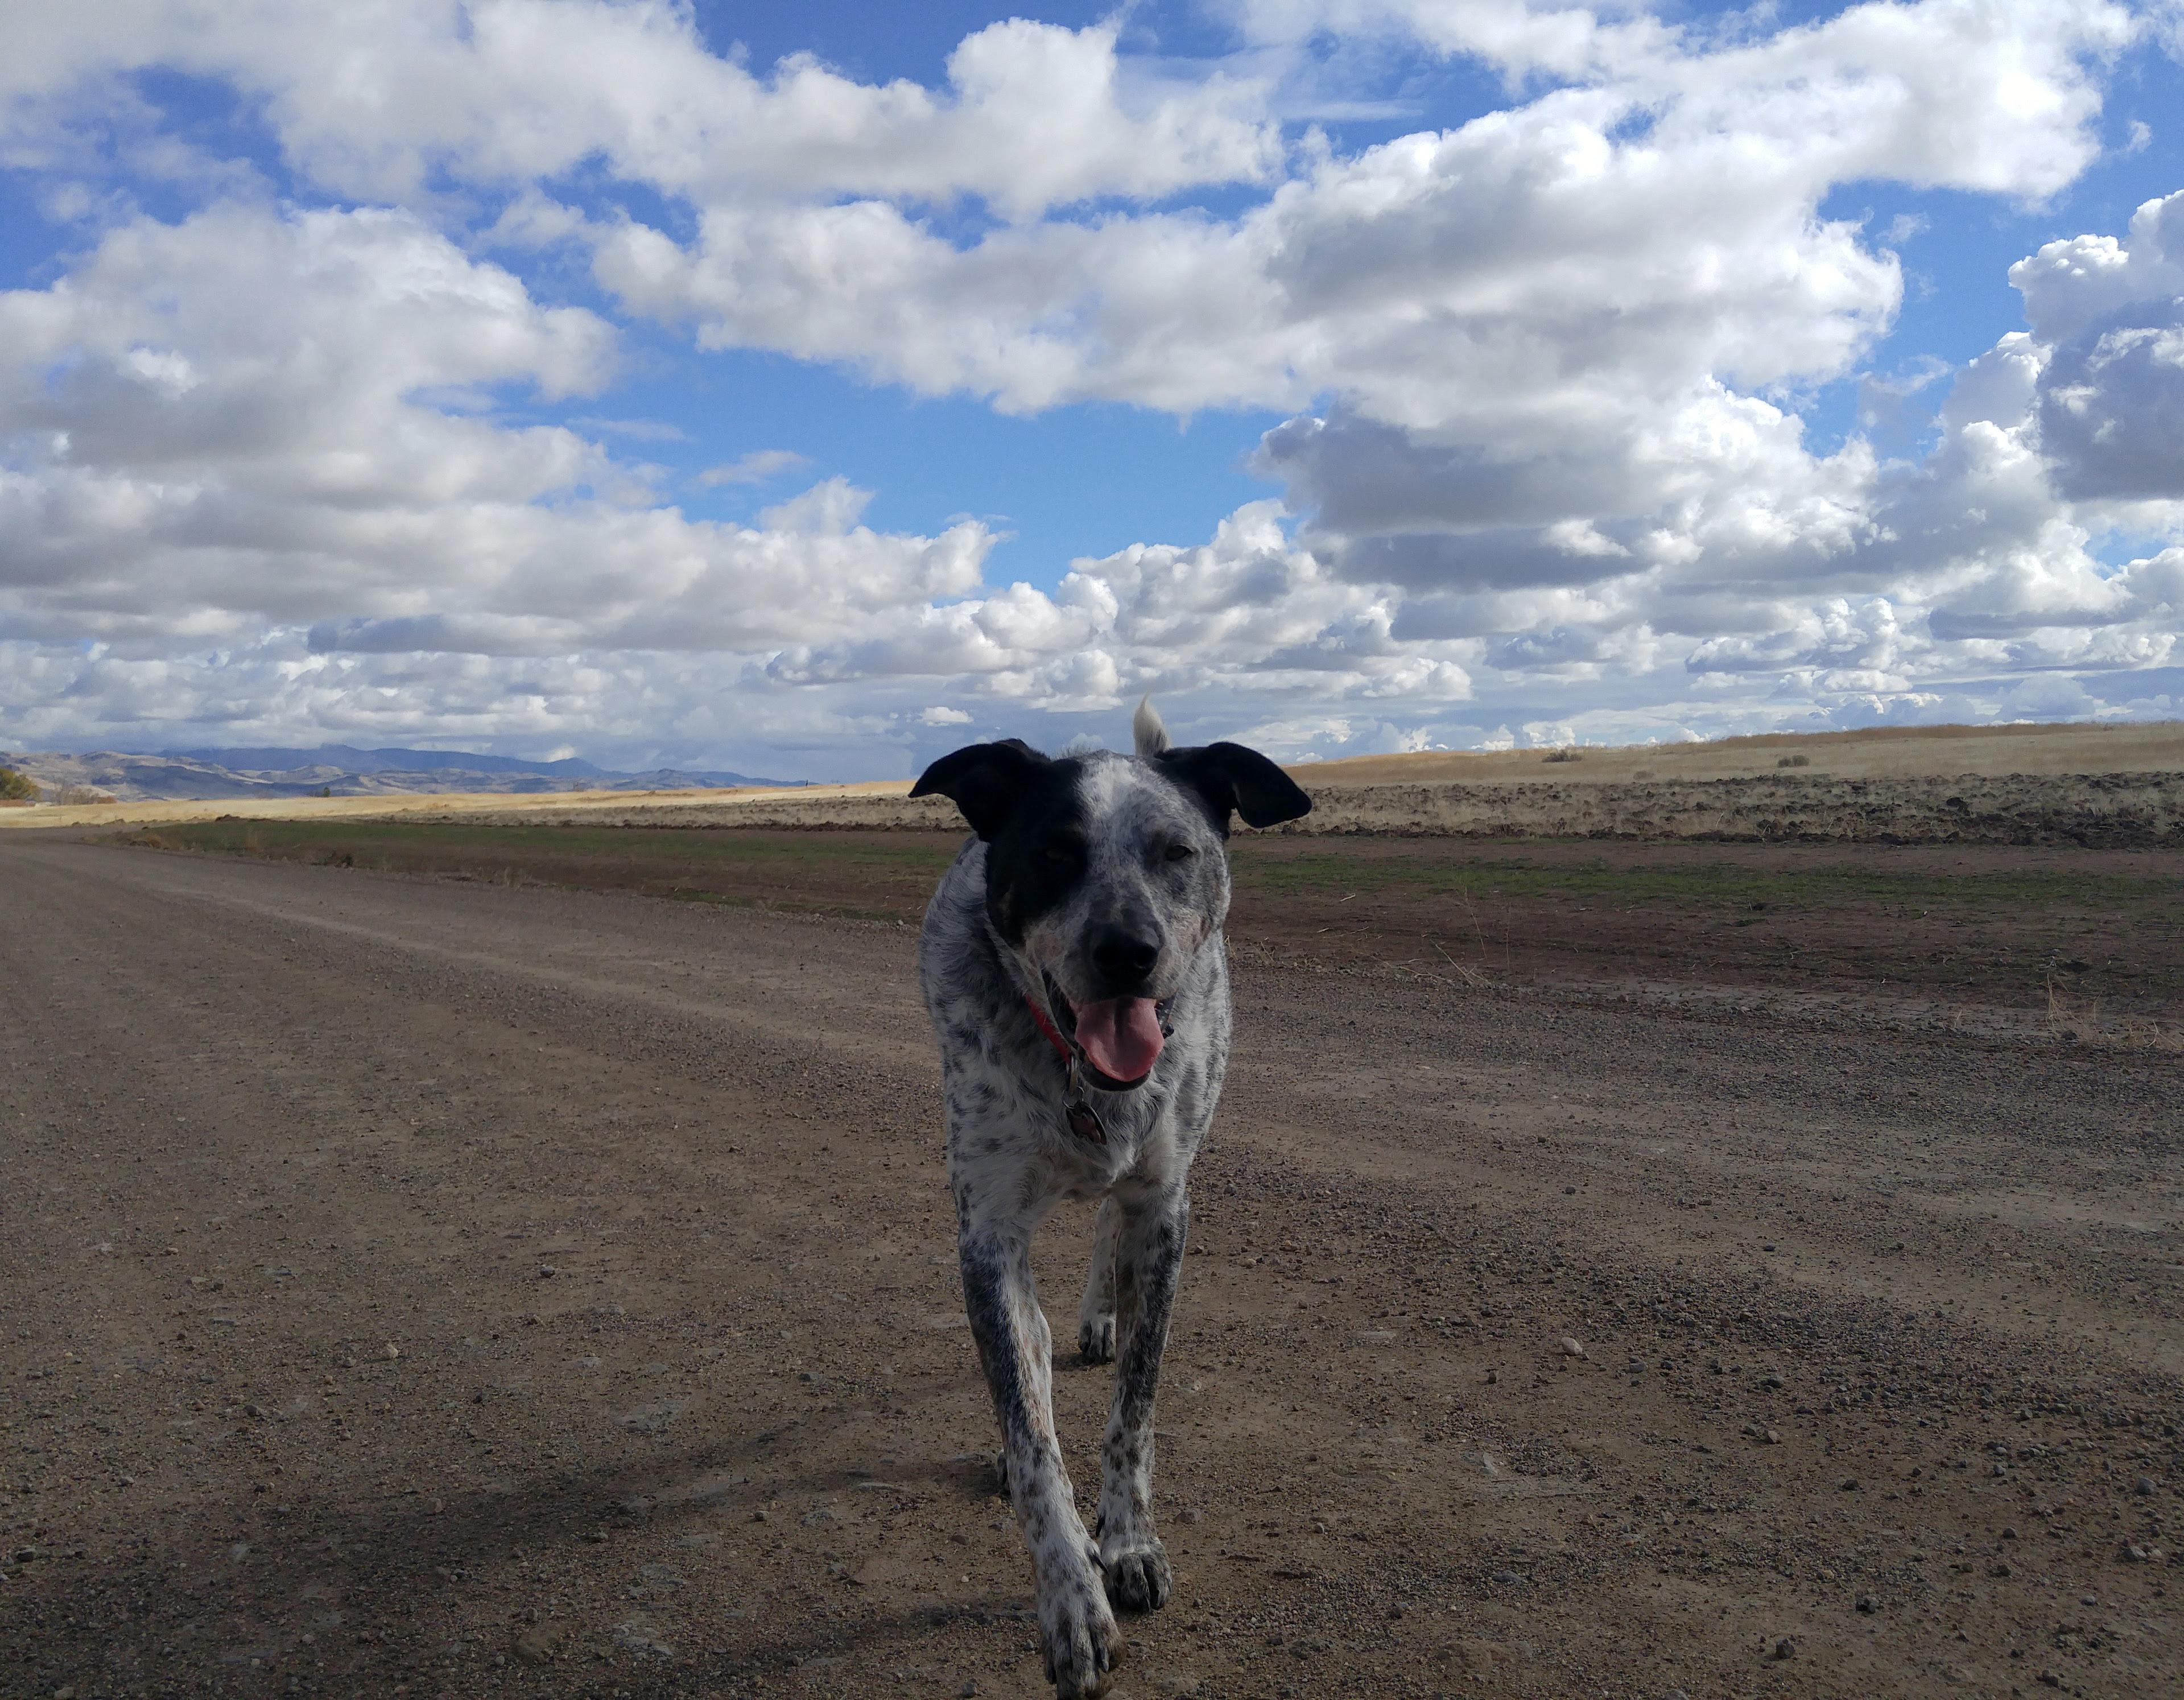 Blue Healer Idaho Dirt Road under Clouded Sky